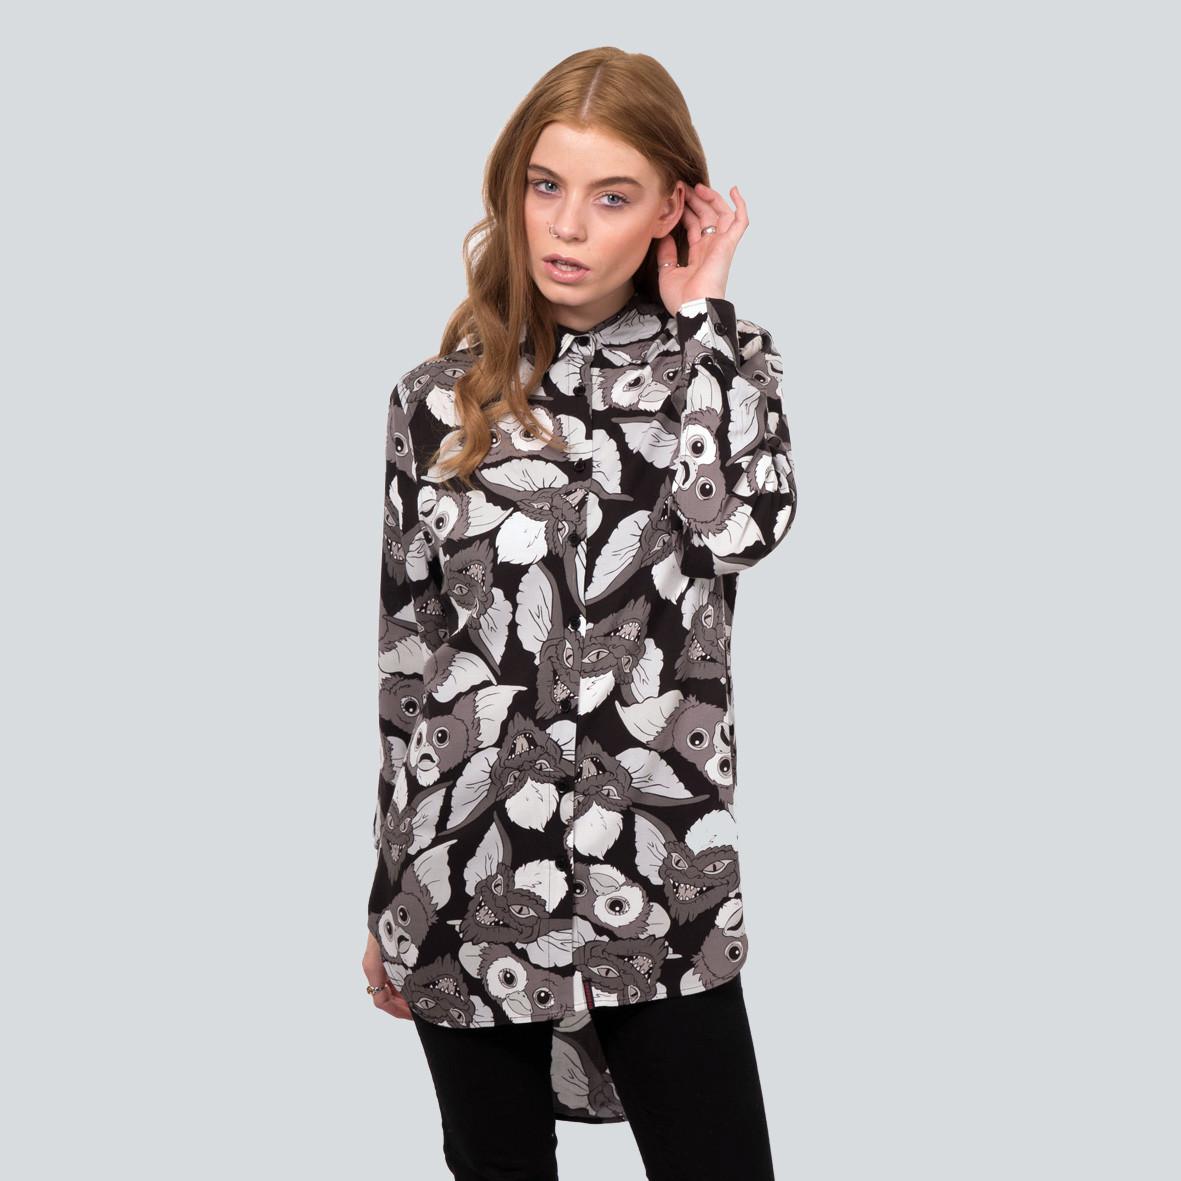 6204a3e8ce55 [Fashion] DROPDEAD Gremlins Collection